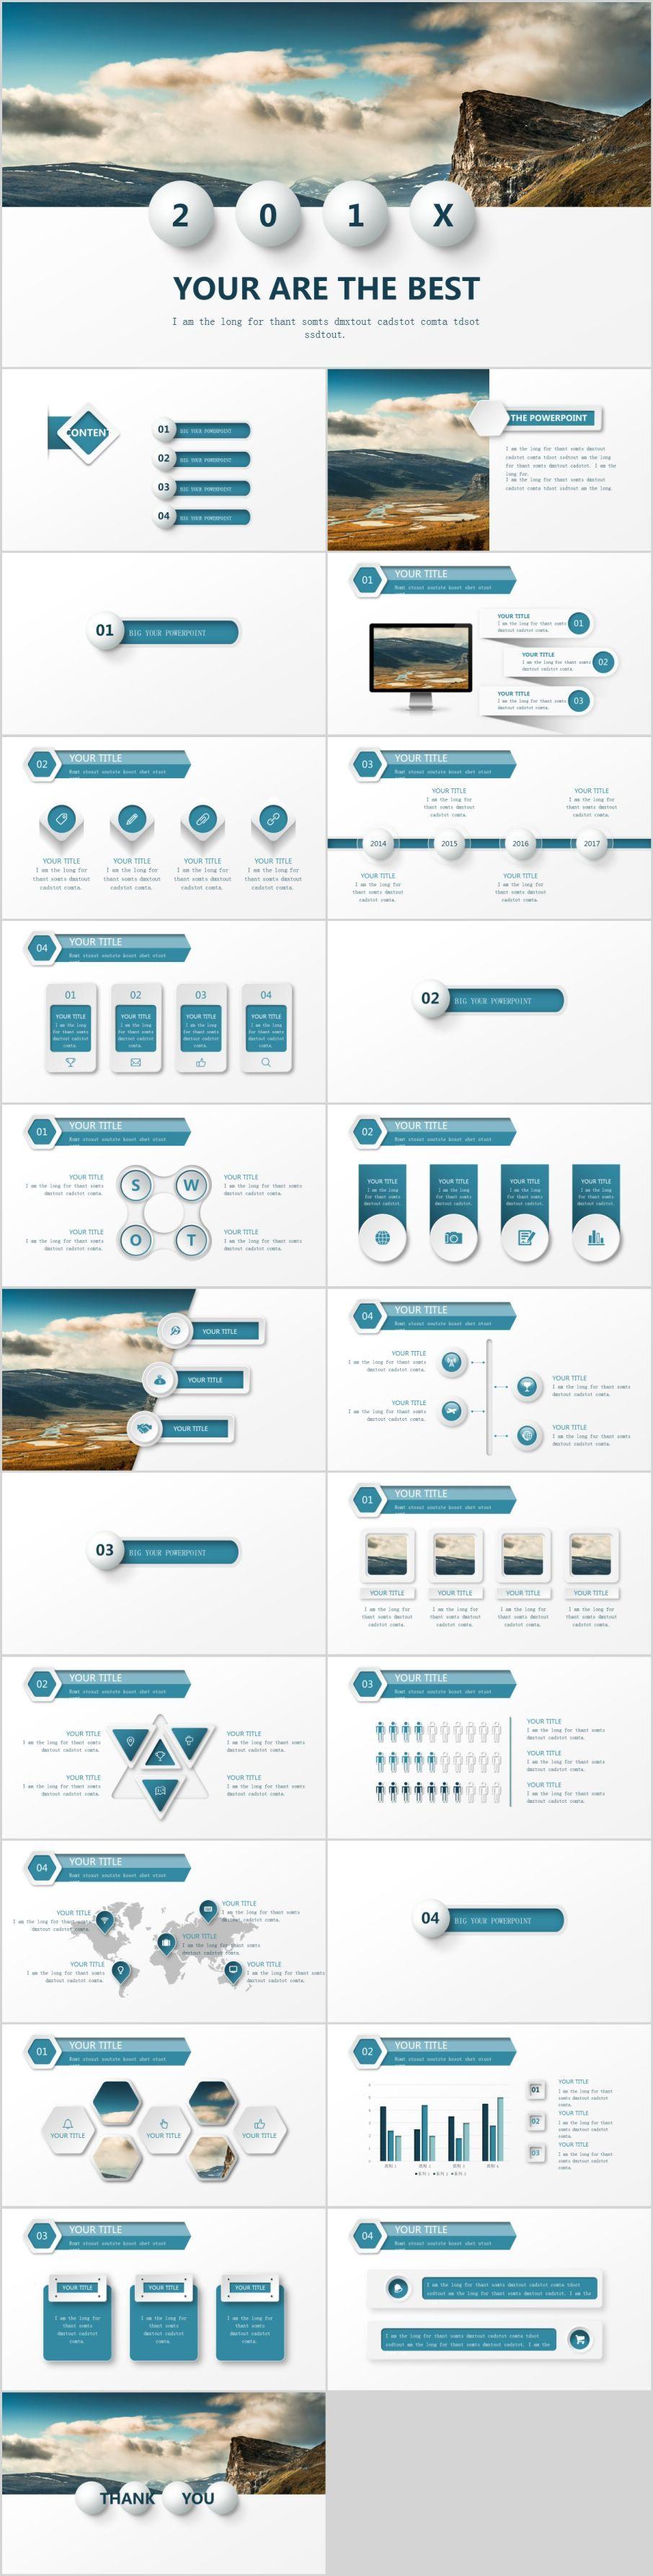 24 Best Blue Annnual Report Powerpoint Templates Template